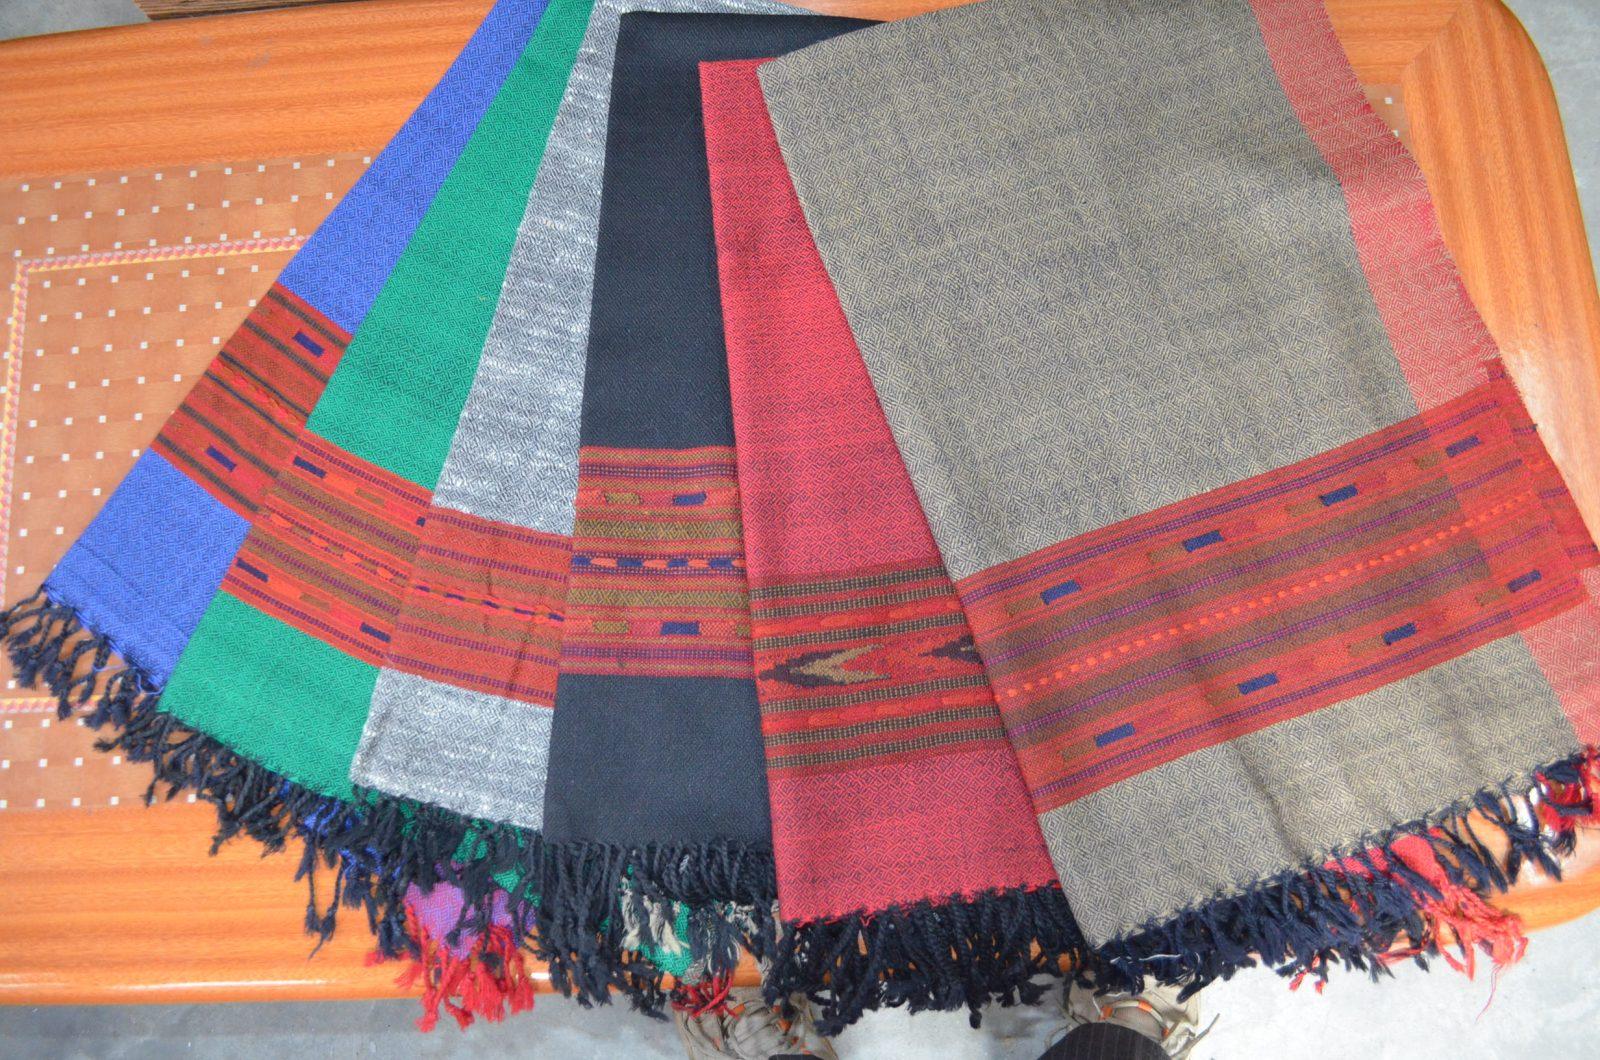 The Himalayan Weavers Handloom and Handicrafts Industrial Co-operative Society Ltd.